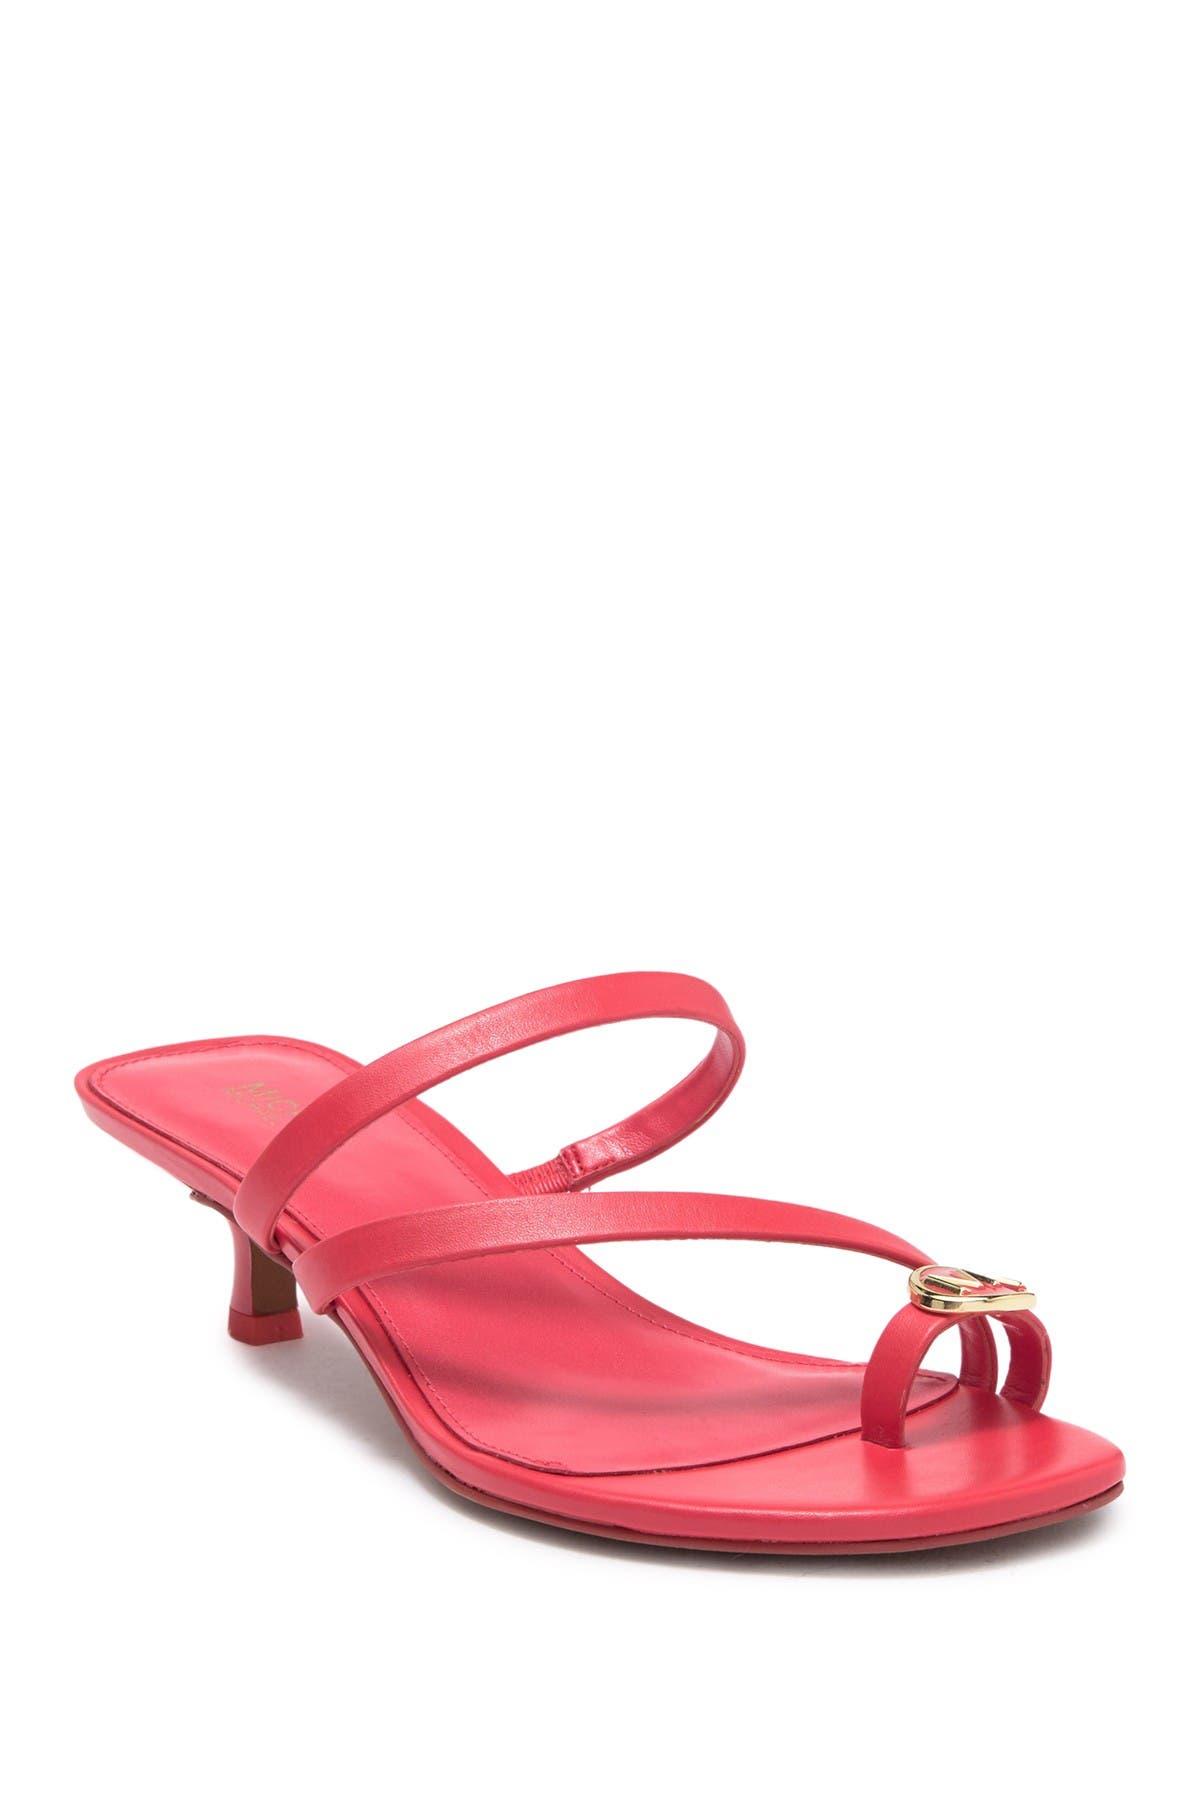 Image of MICHAEL Michael Kors Letty Strappy Kitten Heel Sandal